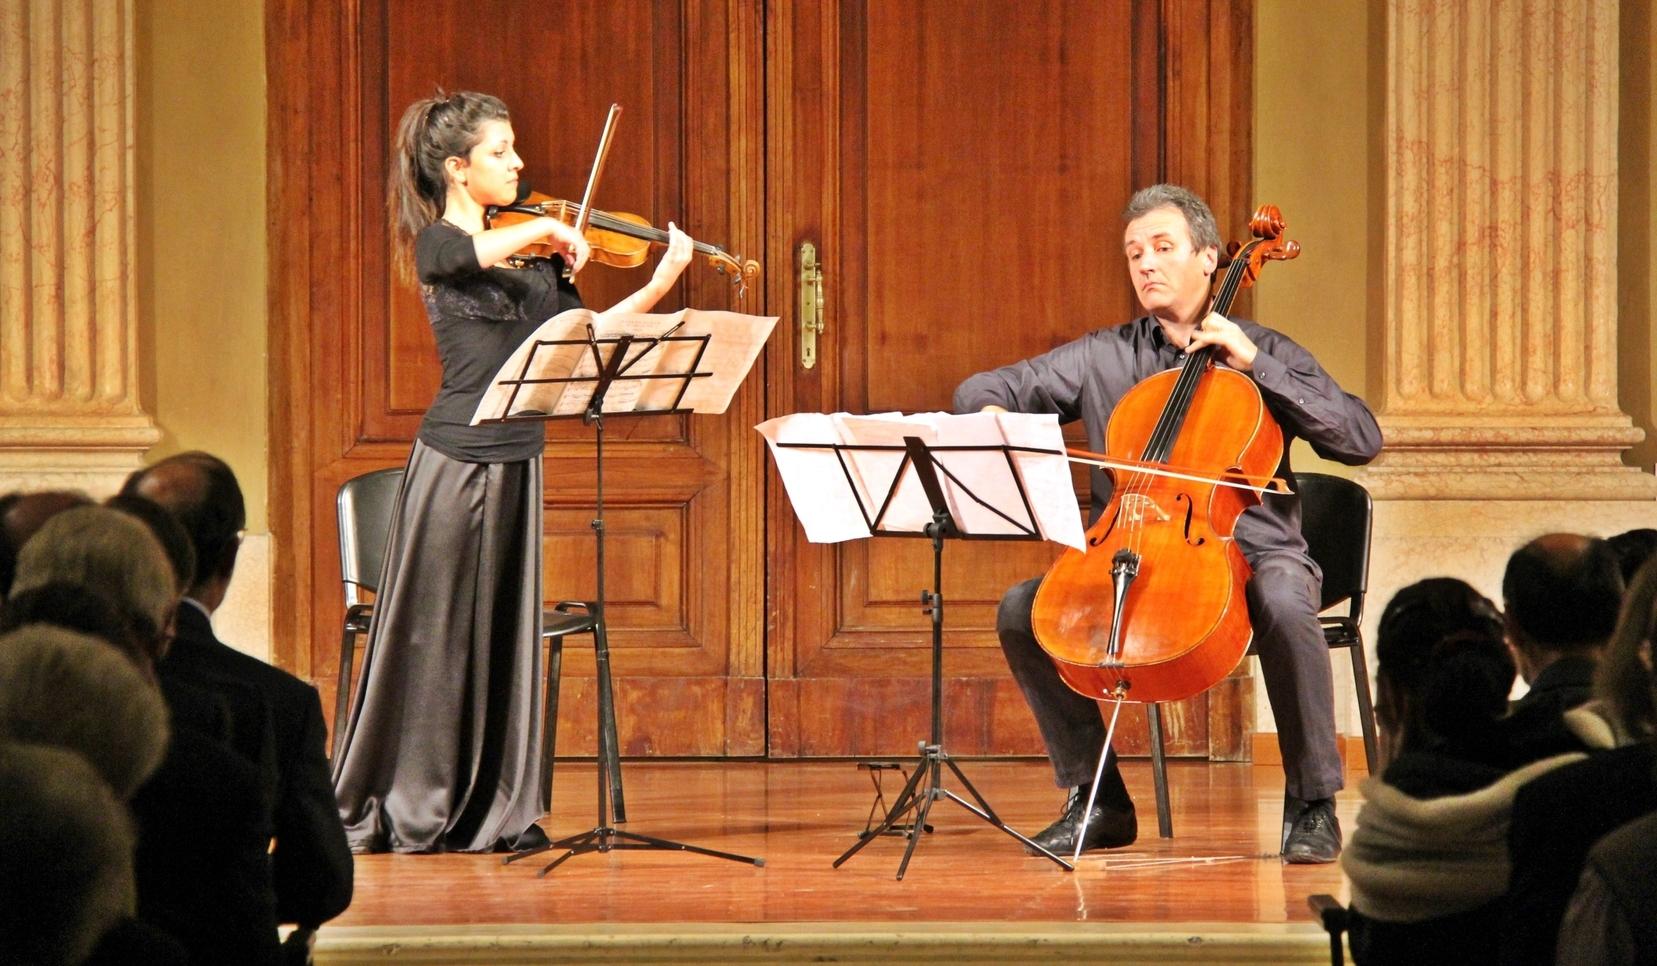 francesca-temporin-violino-riv